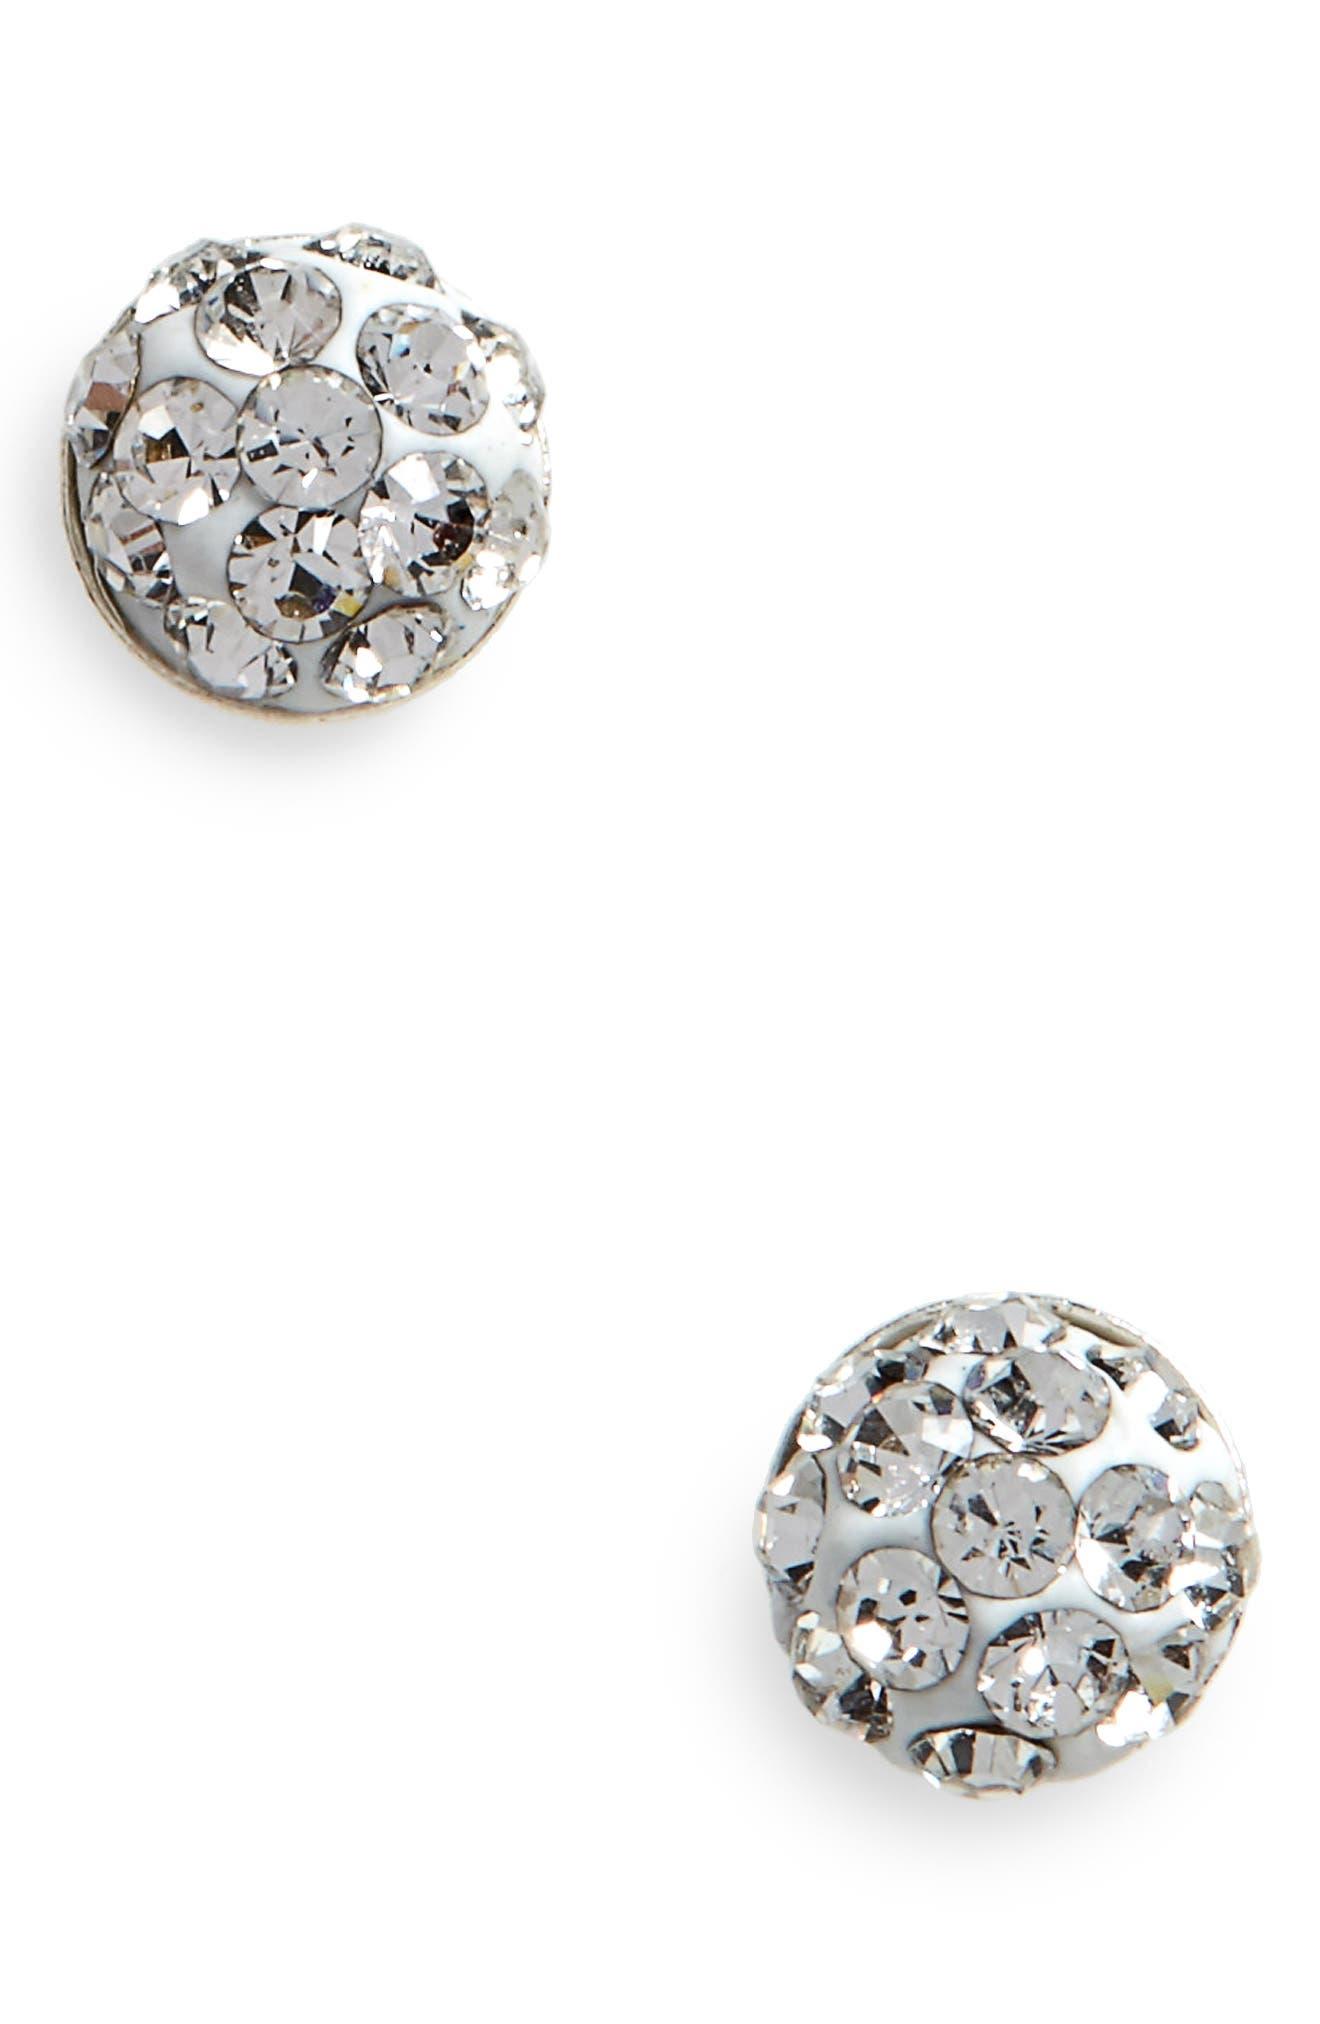 Crystal & Sterling Silver Stud Earrings,                         Main,                         color,